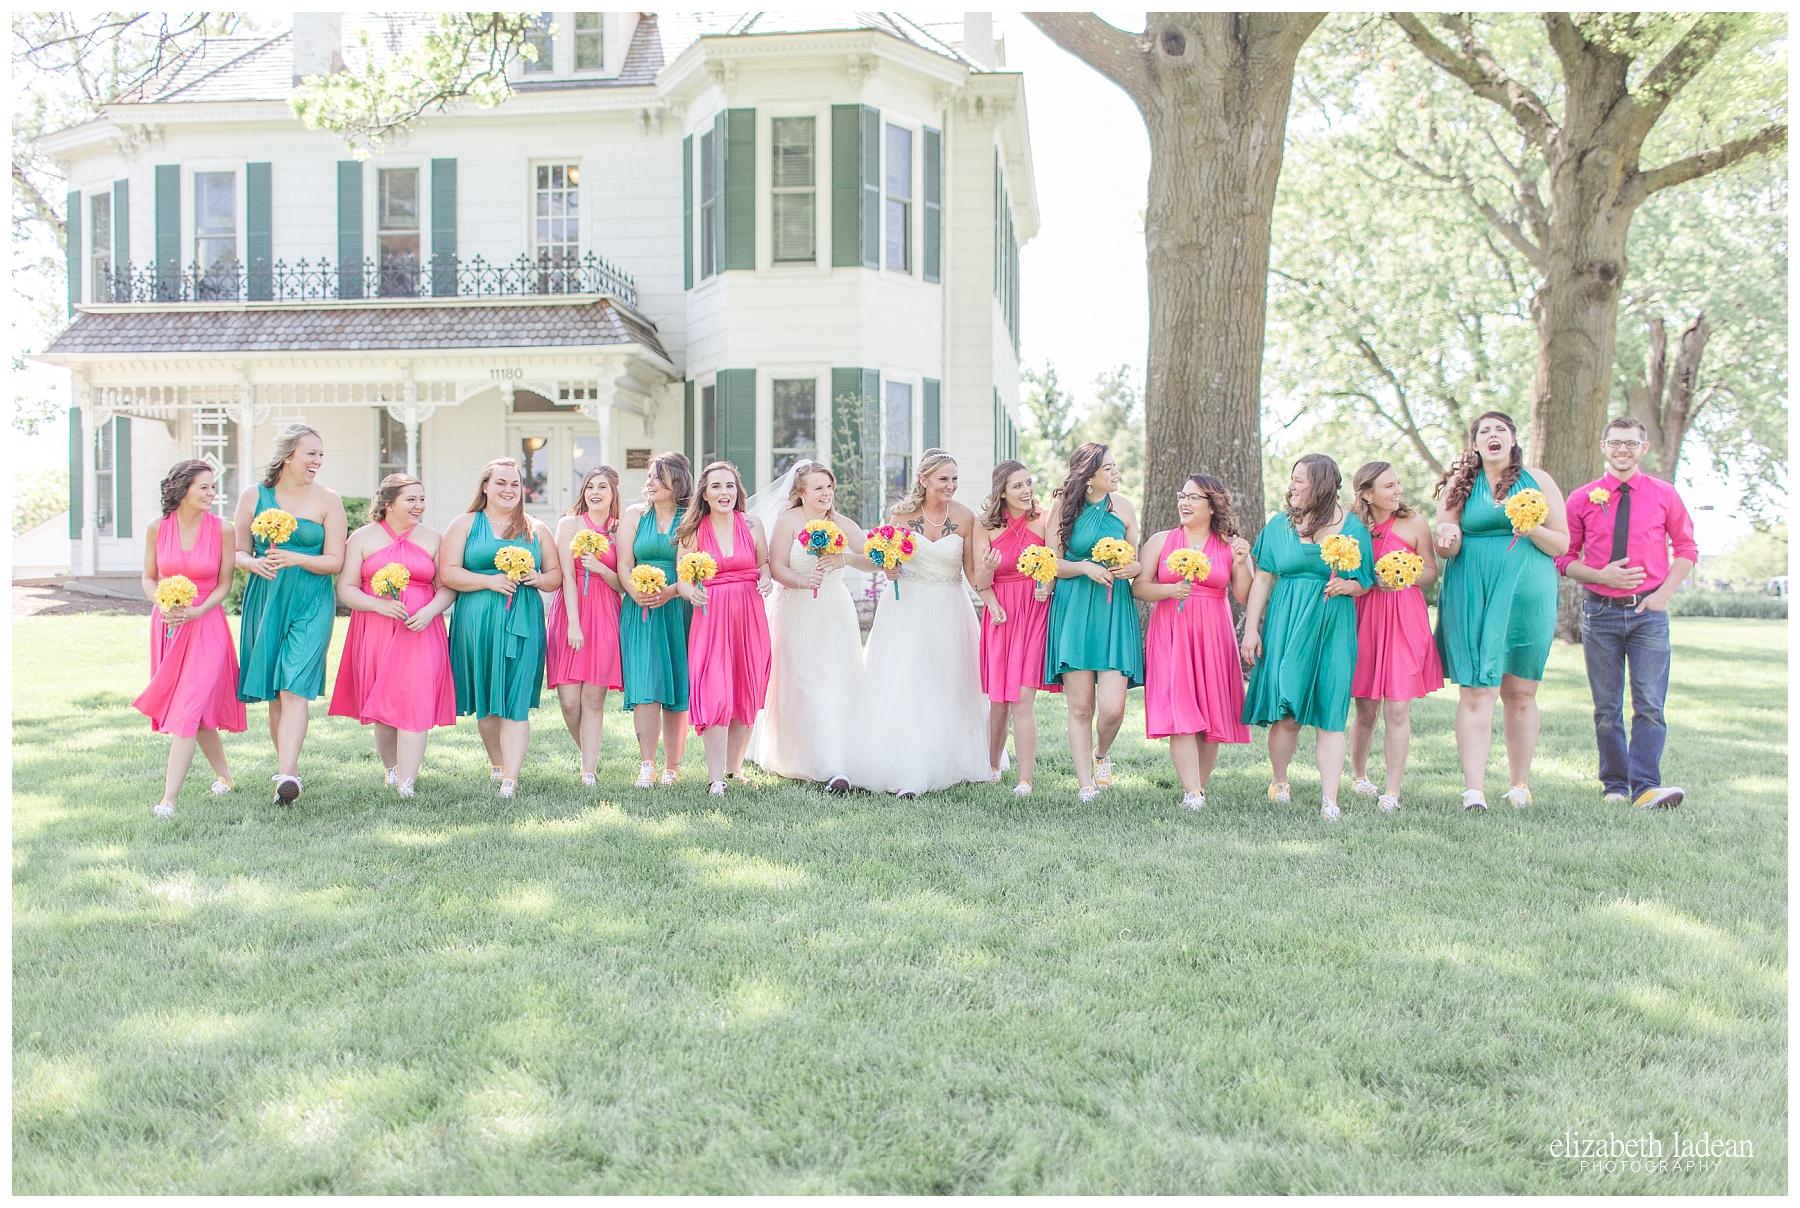 Thompson-Barn-Kansas-Wedding-Photography-R+J-0505-Elizabeth-Ladean-Photography-photo_0704.jpg